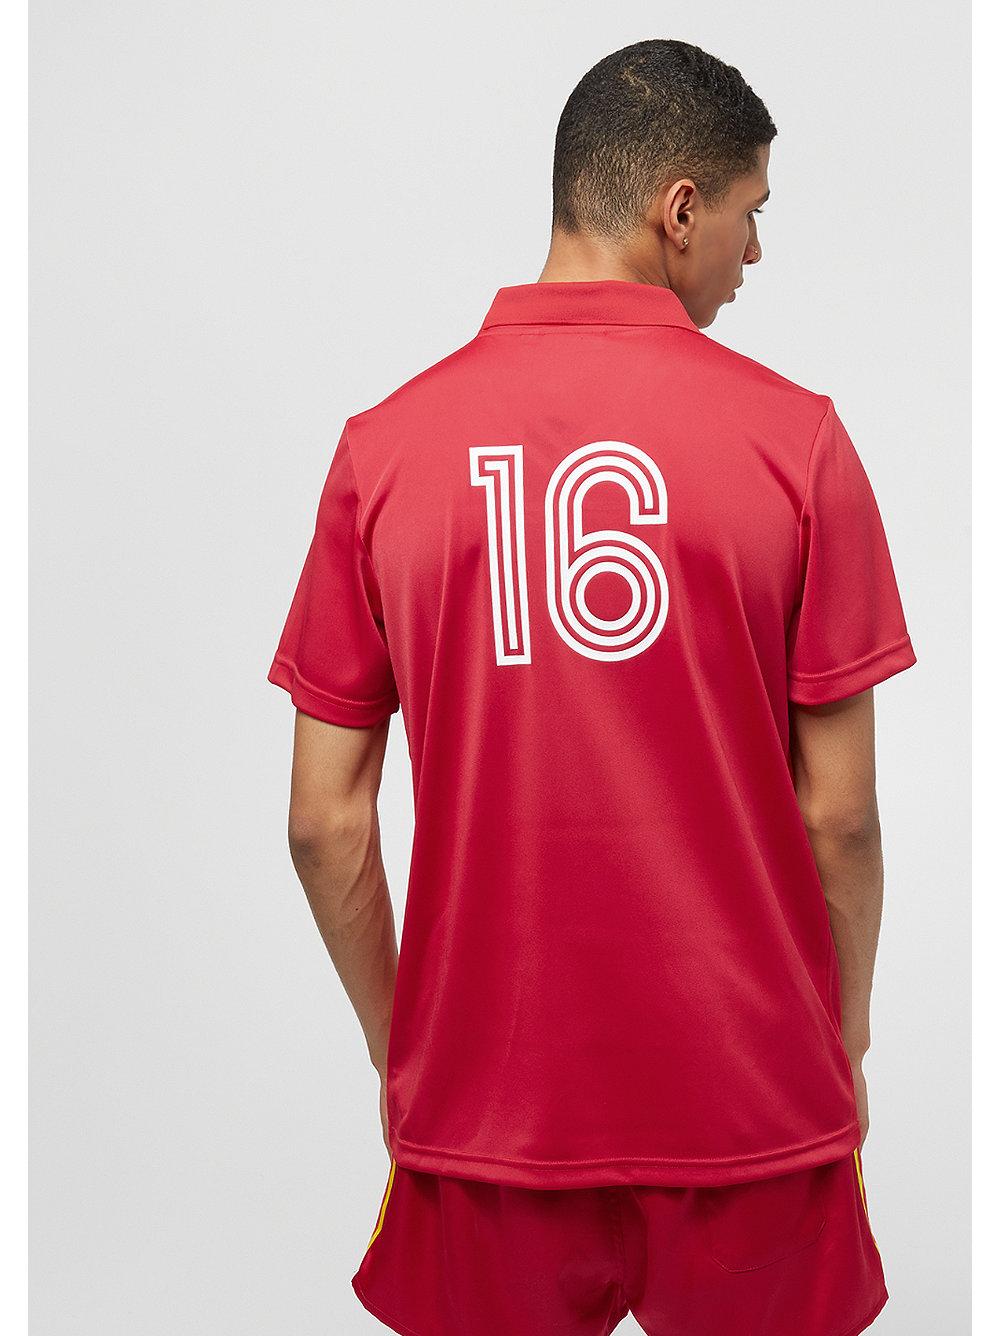 6b7599040 Camiseta Belgium Jersey victory red de adidas en SNIPES